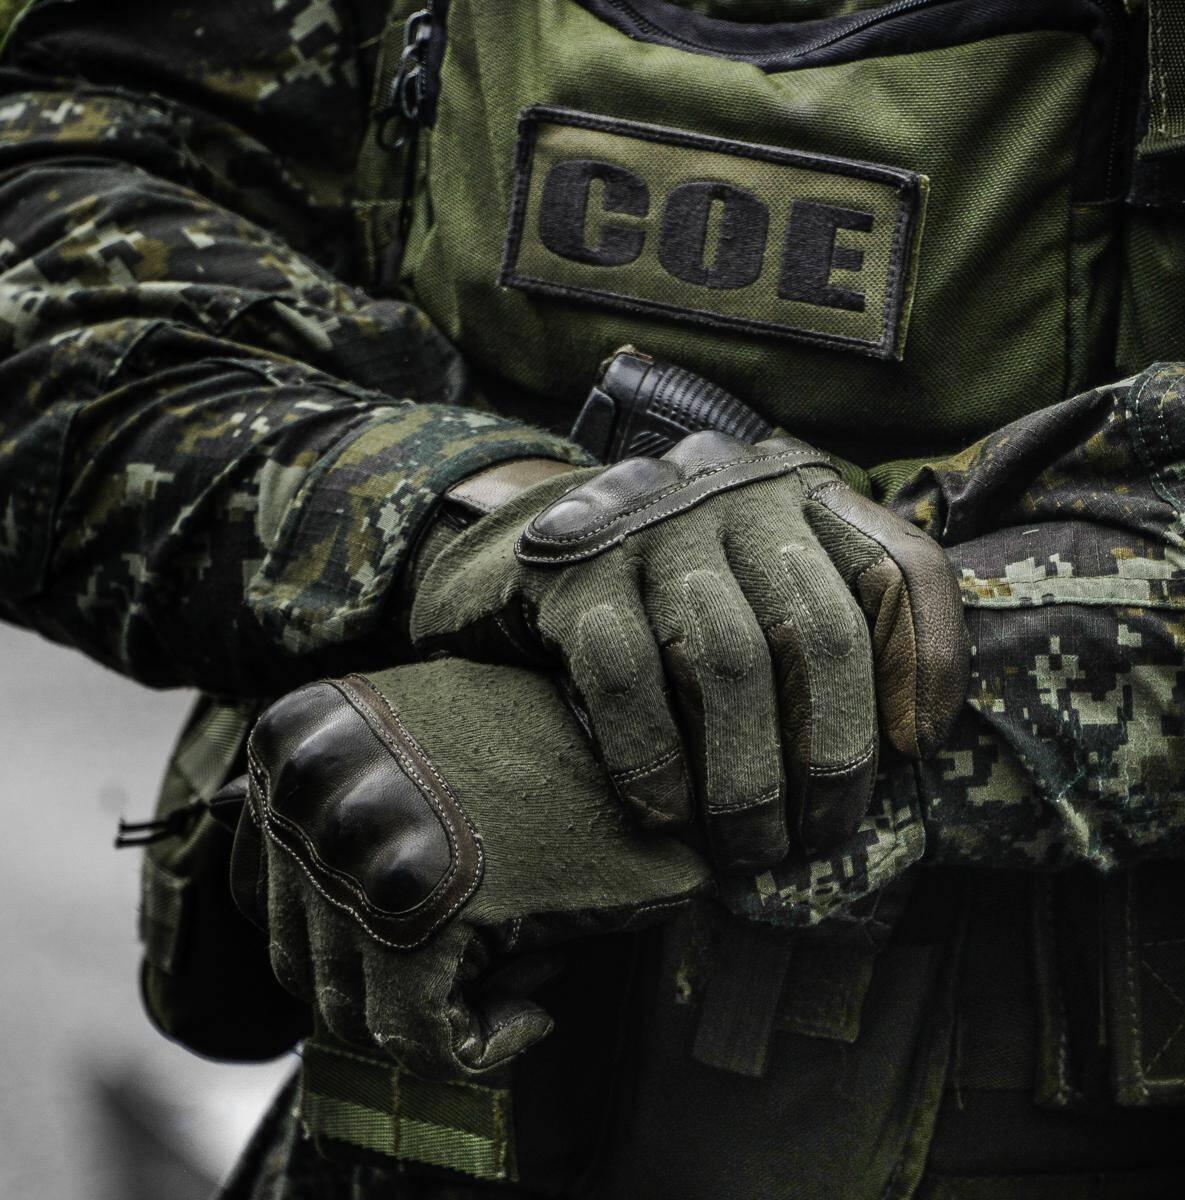 COE PM - SP. Foto: Major PM Luis Augusto Pacheco Ambar